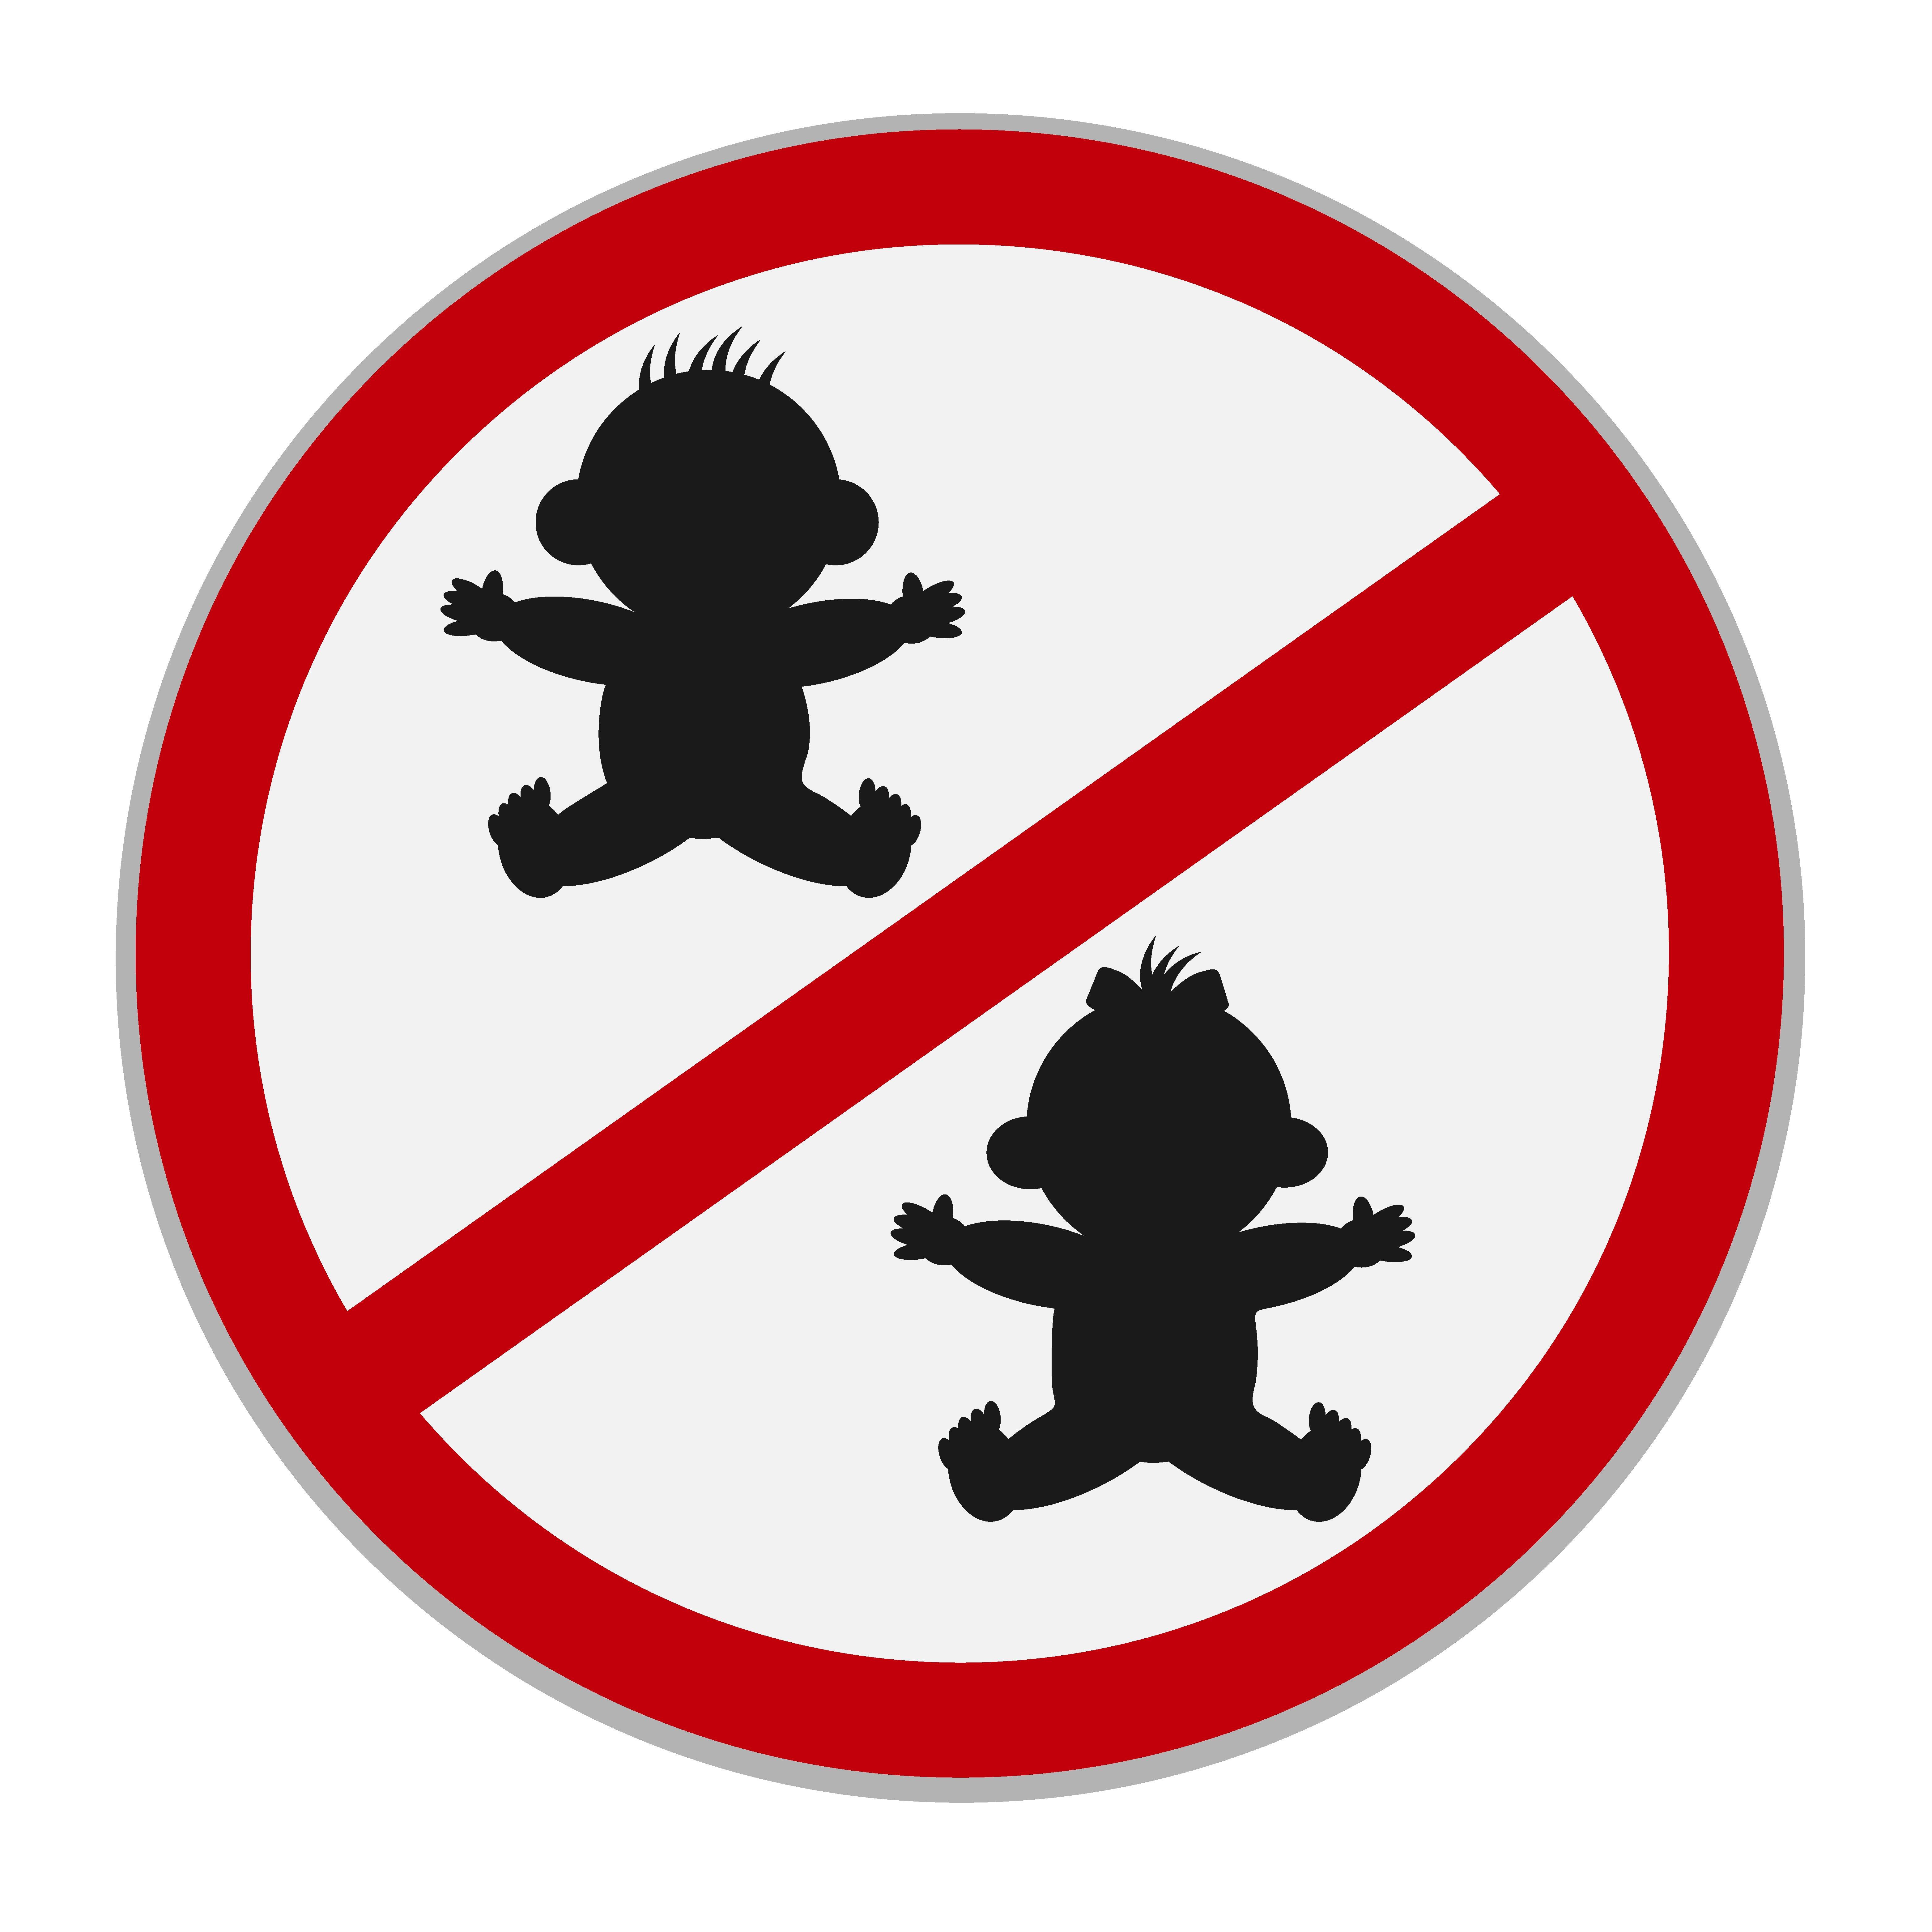 No kids allowed sign vector illustrations creative market buycottarizona